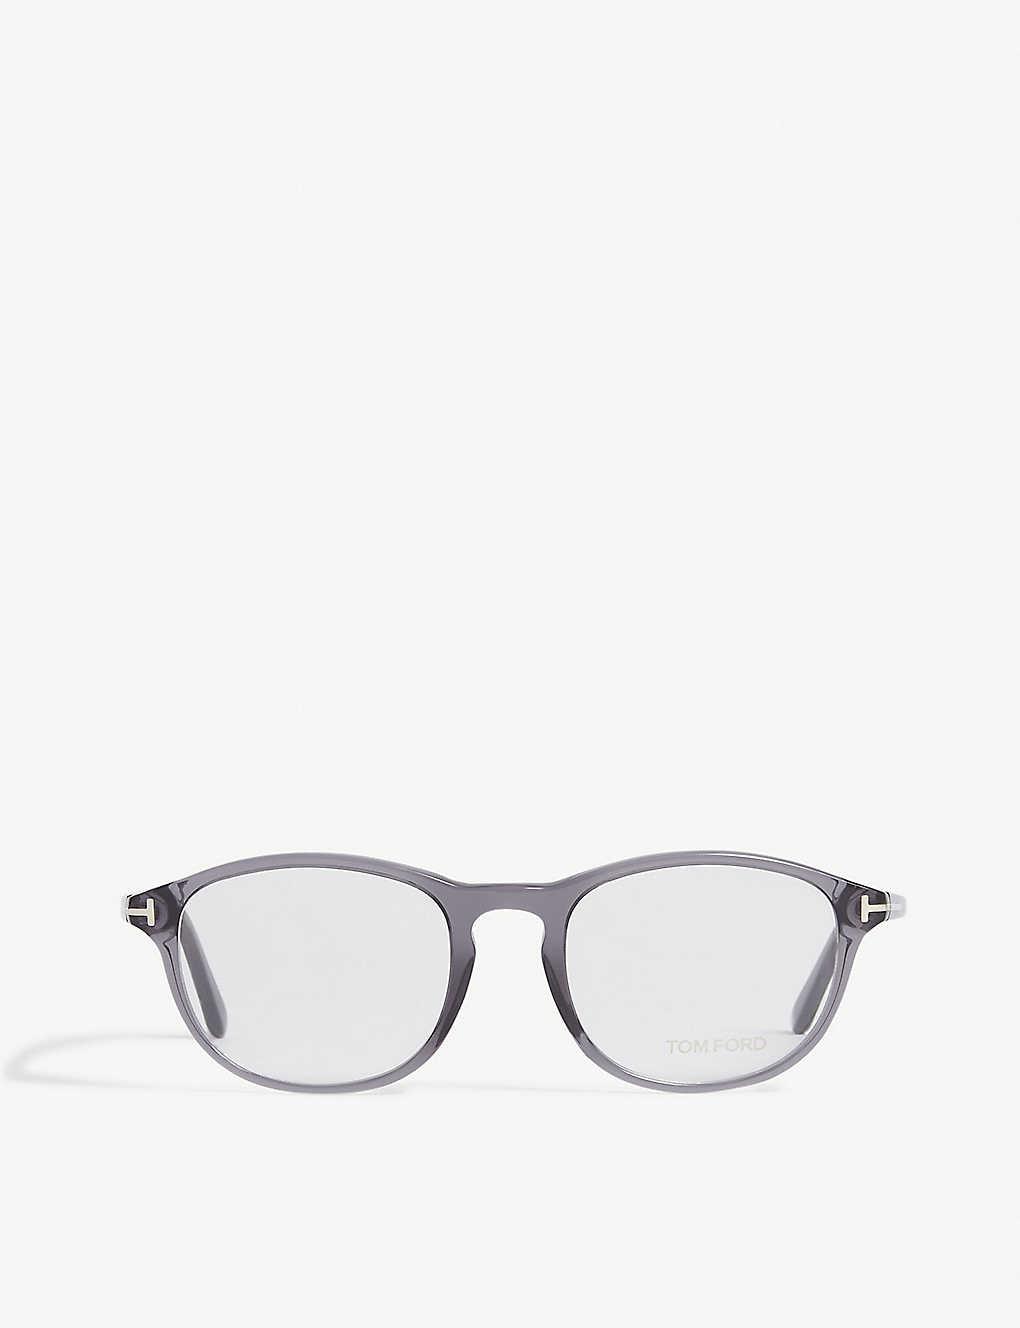 f22fb8c8423 TOM FORD - TF5427 square-frame glasses